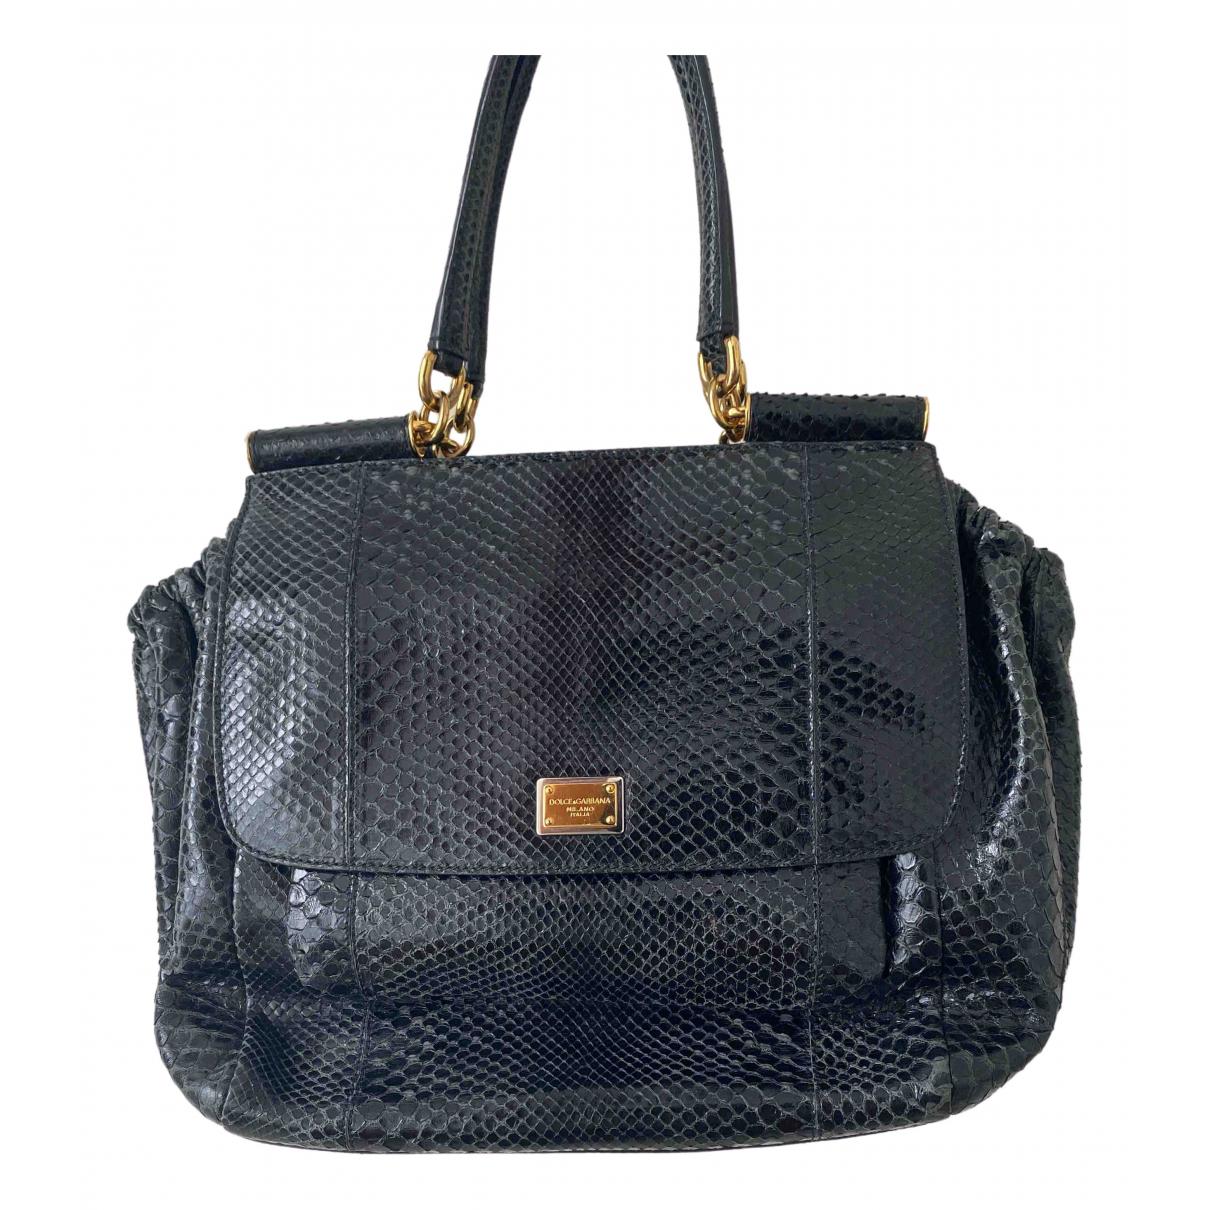 Dolce & Gabbana Sicily Black Python handbag for Women \N